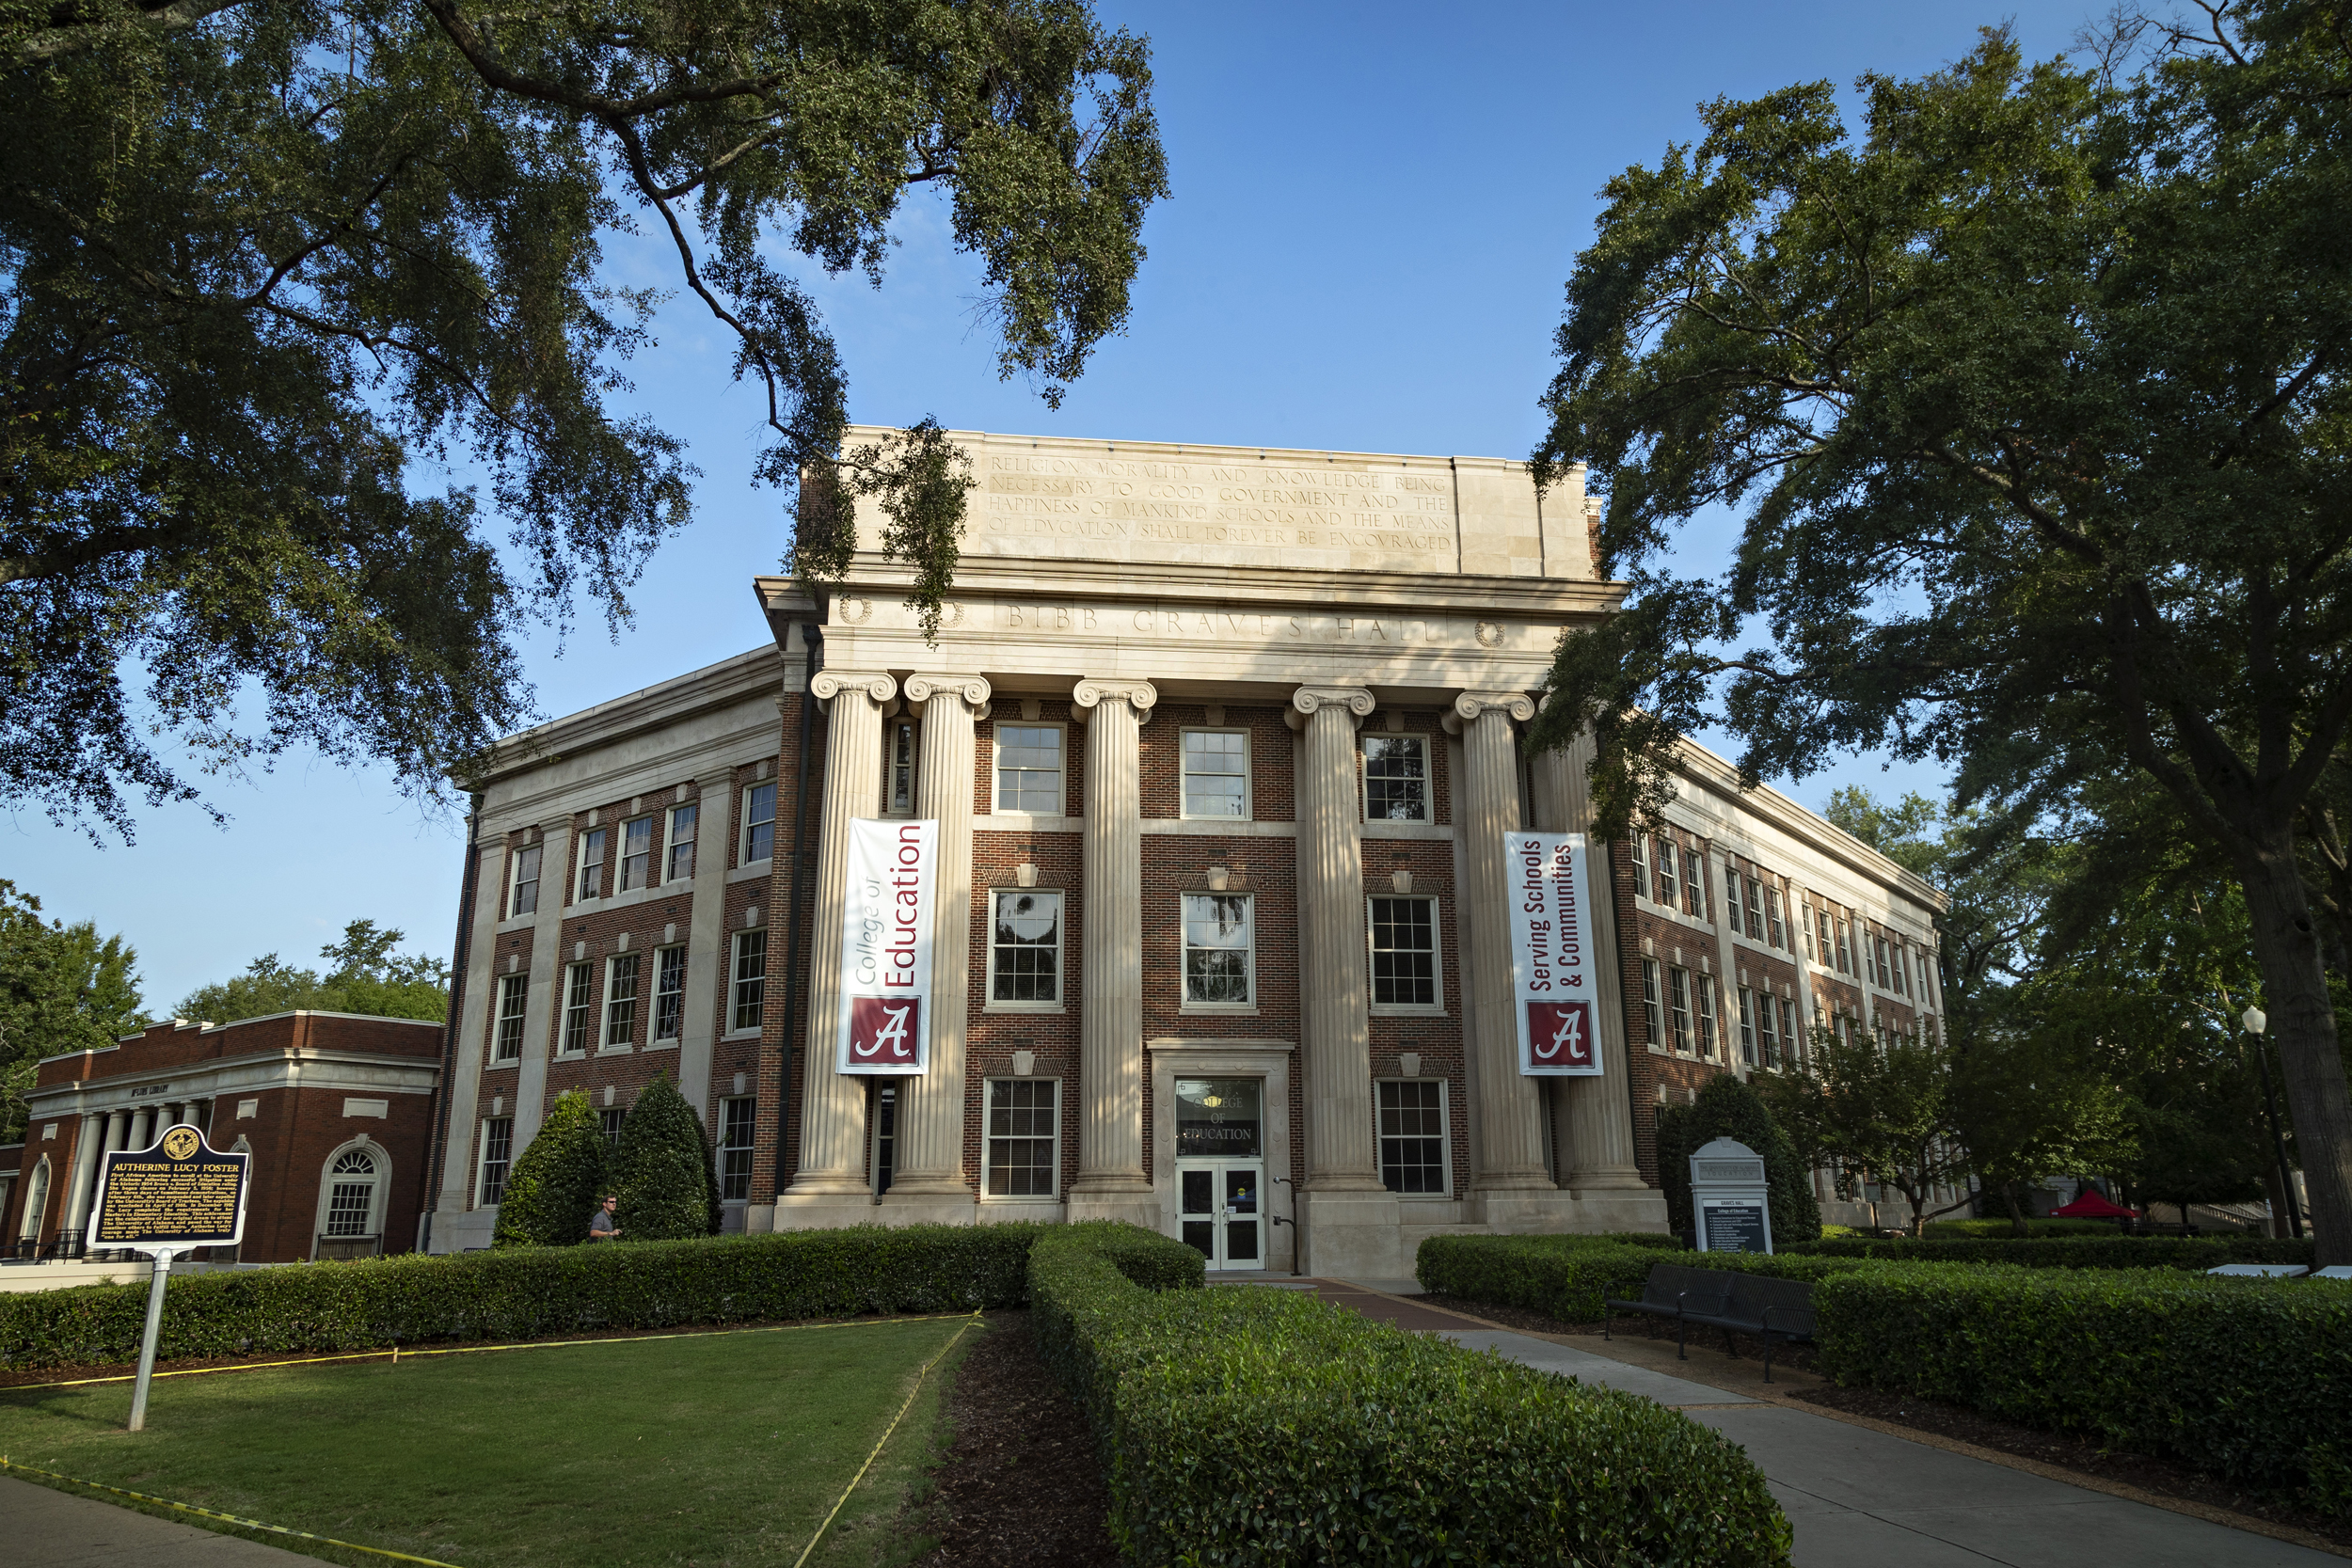 Coronavirus cases among students at University of Alabama climb to more than 1,000